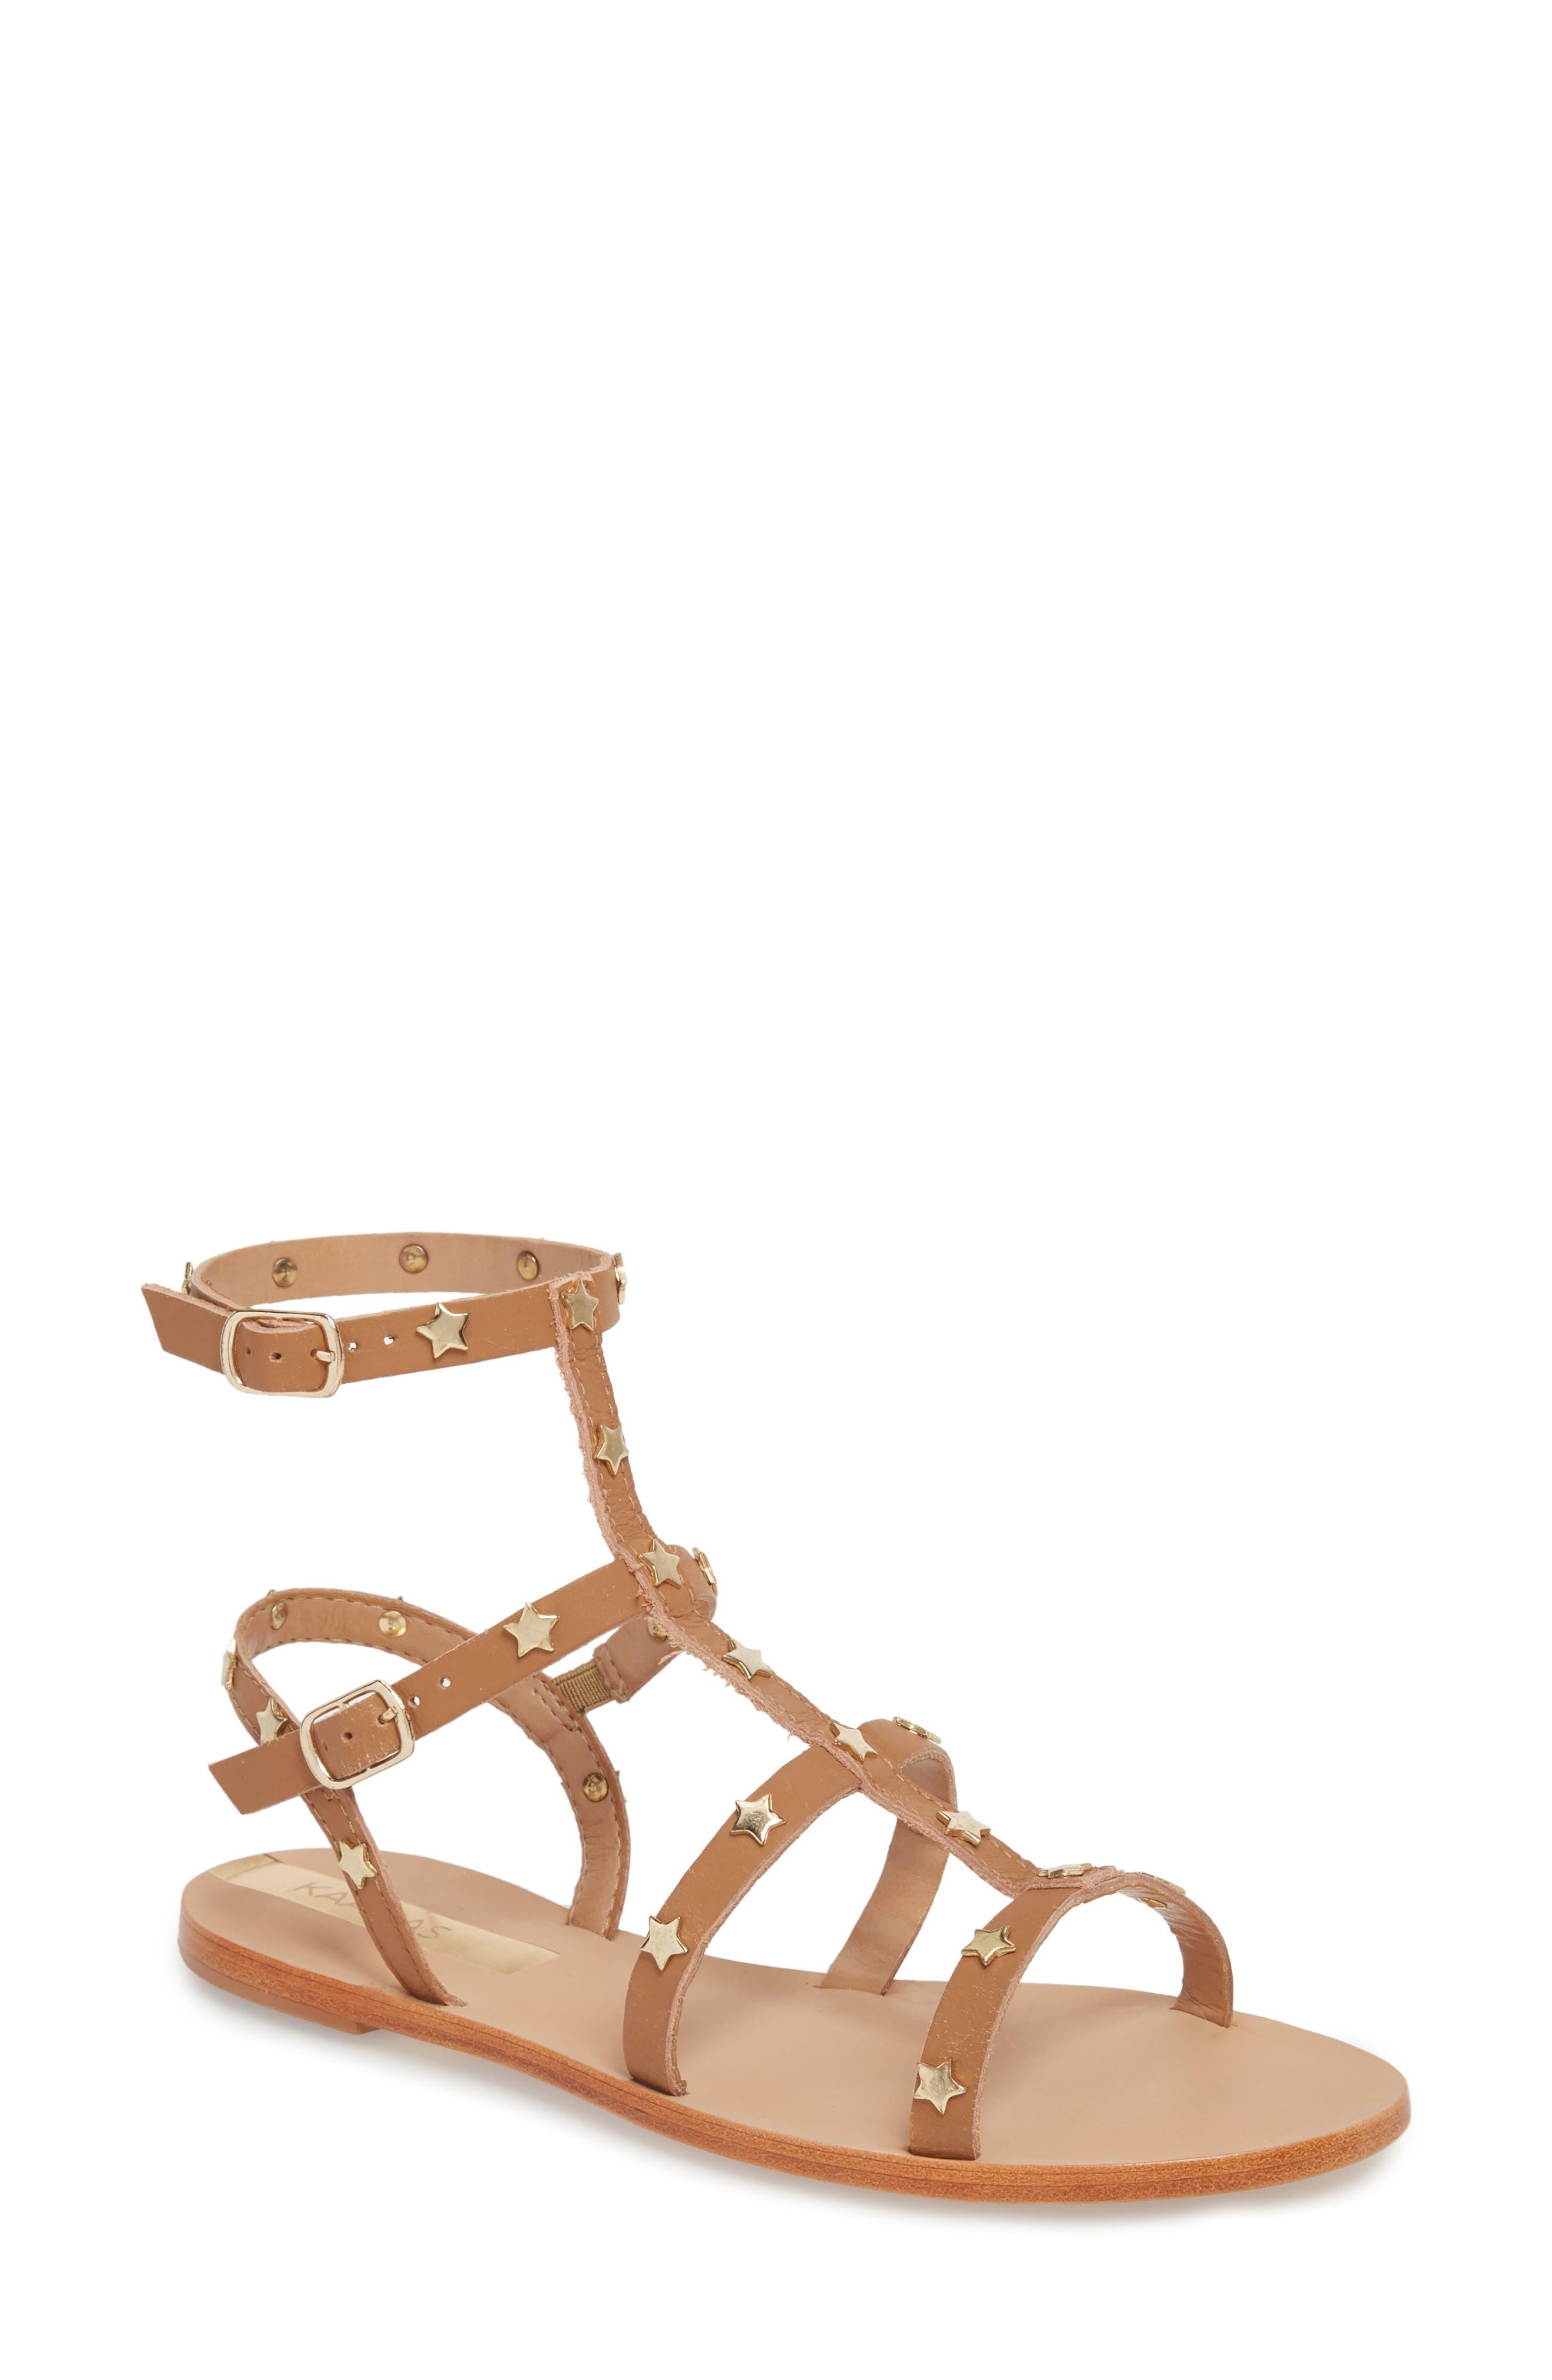 Lapa Gladiator Sandal,                             Main thumbnail 1, color,                             Honey